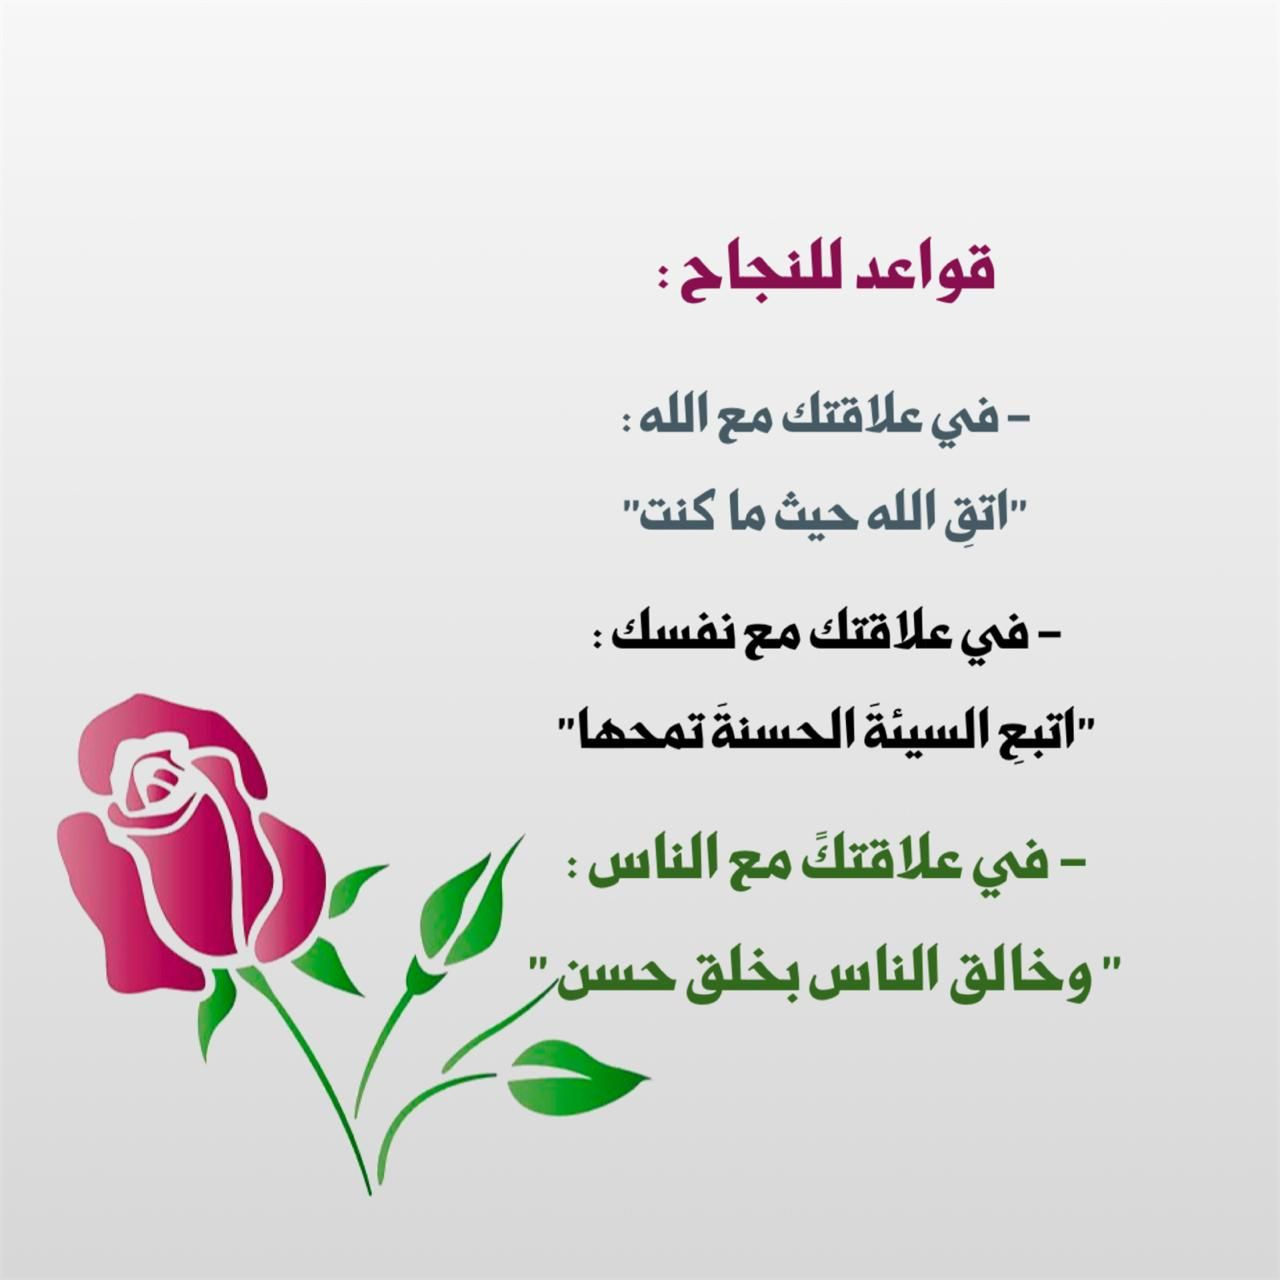 قواعد للنجاح Islamic Quotes Quran Islamic Quotes Words